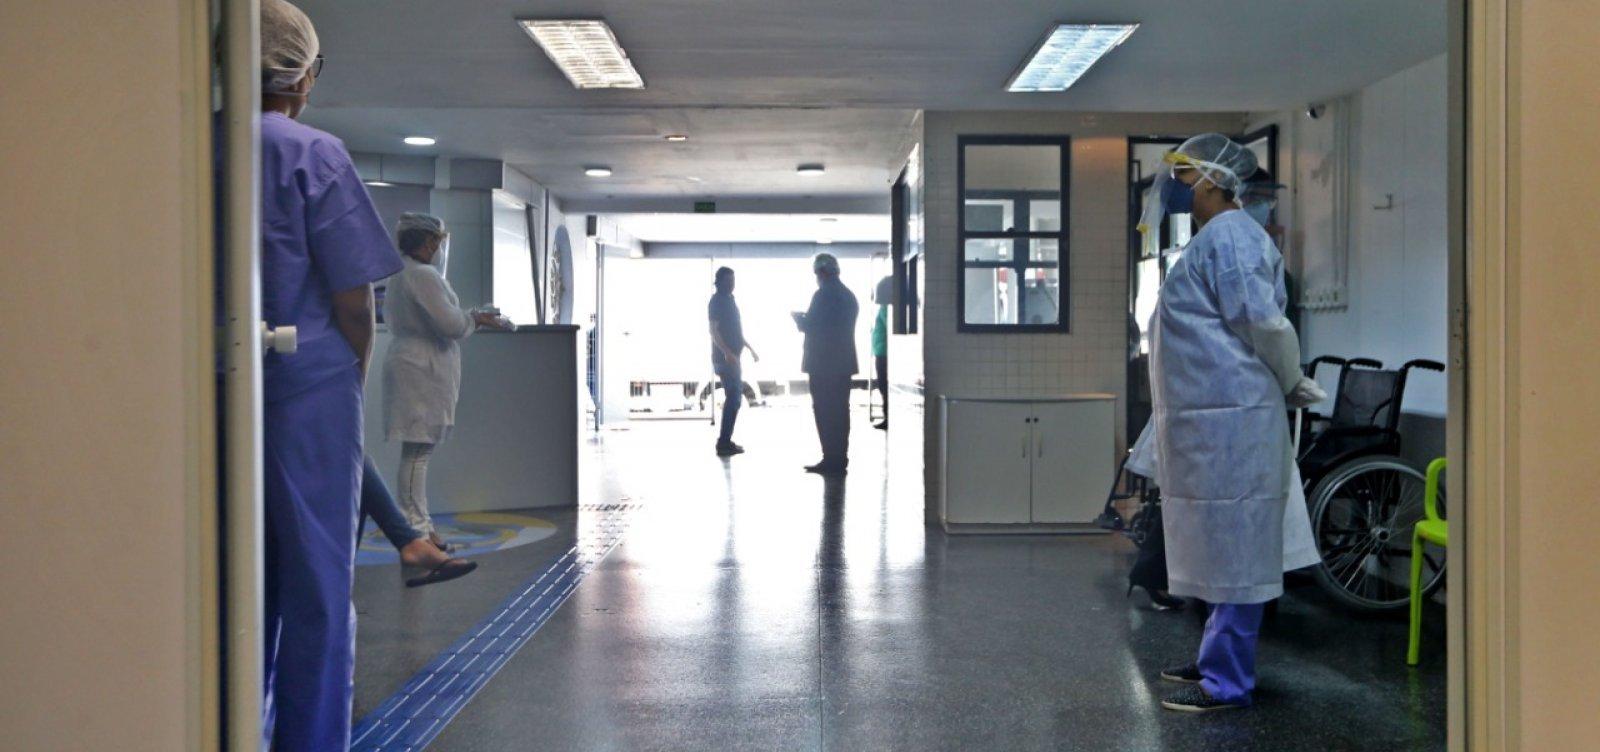 Brasil tem 72.234 mortes por Covid-19, diz consórcio de imprensa